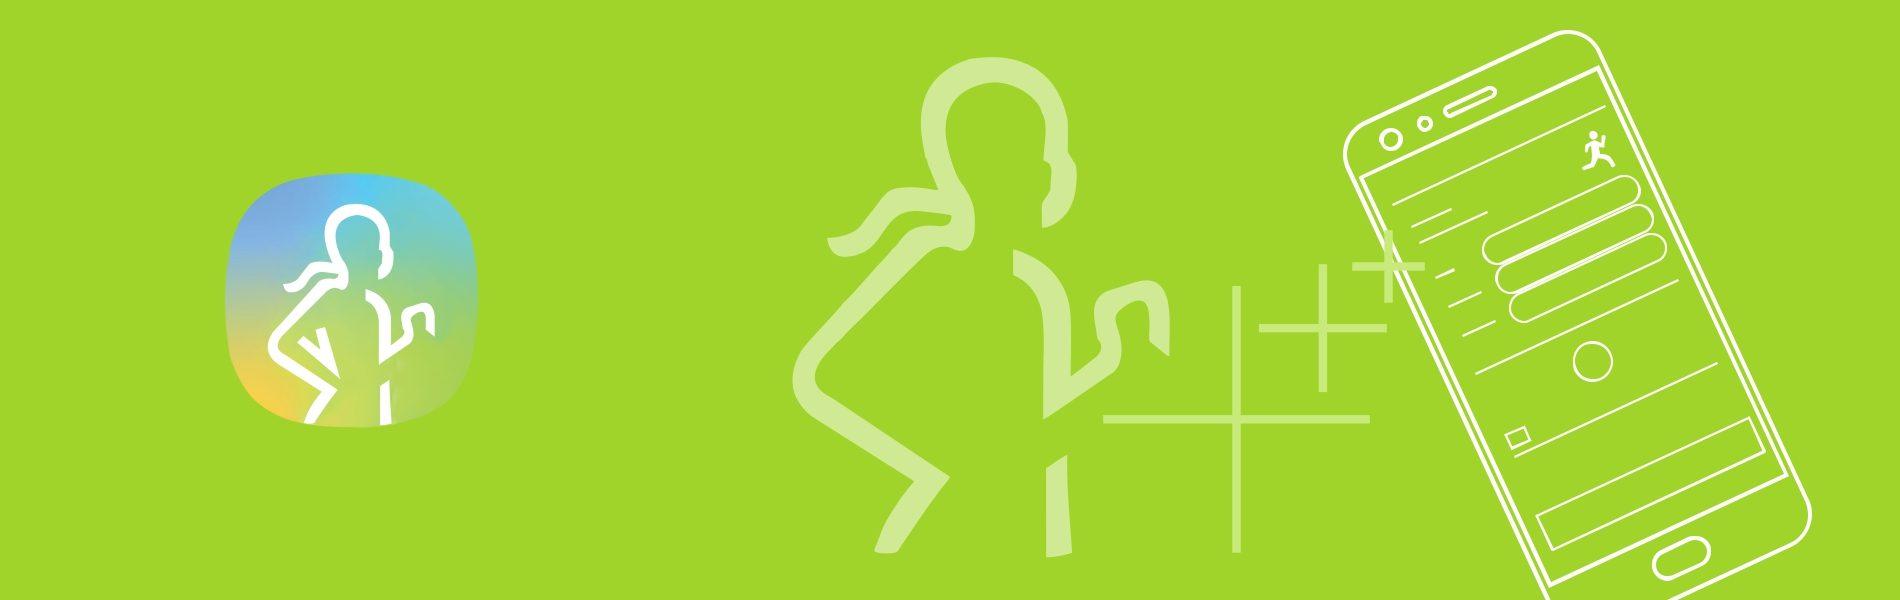 Blog Header add manual data for Samsung Health App Device